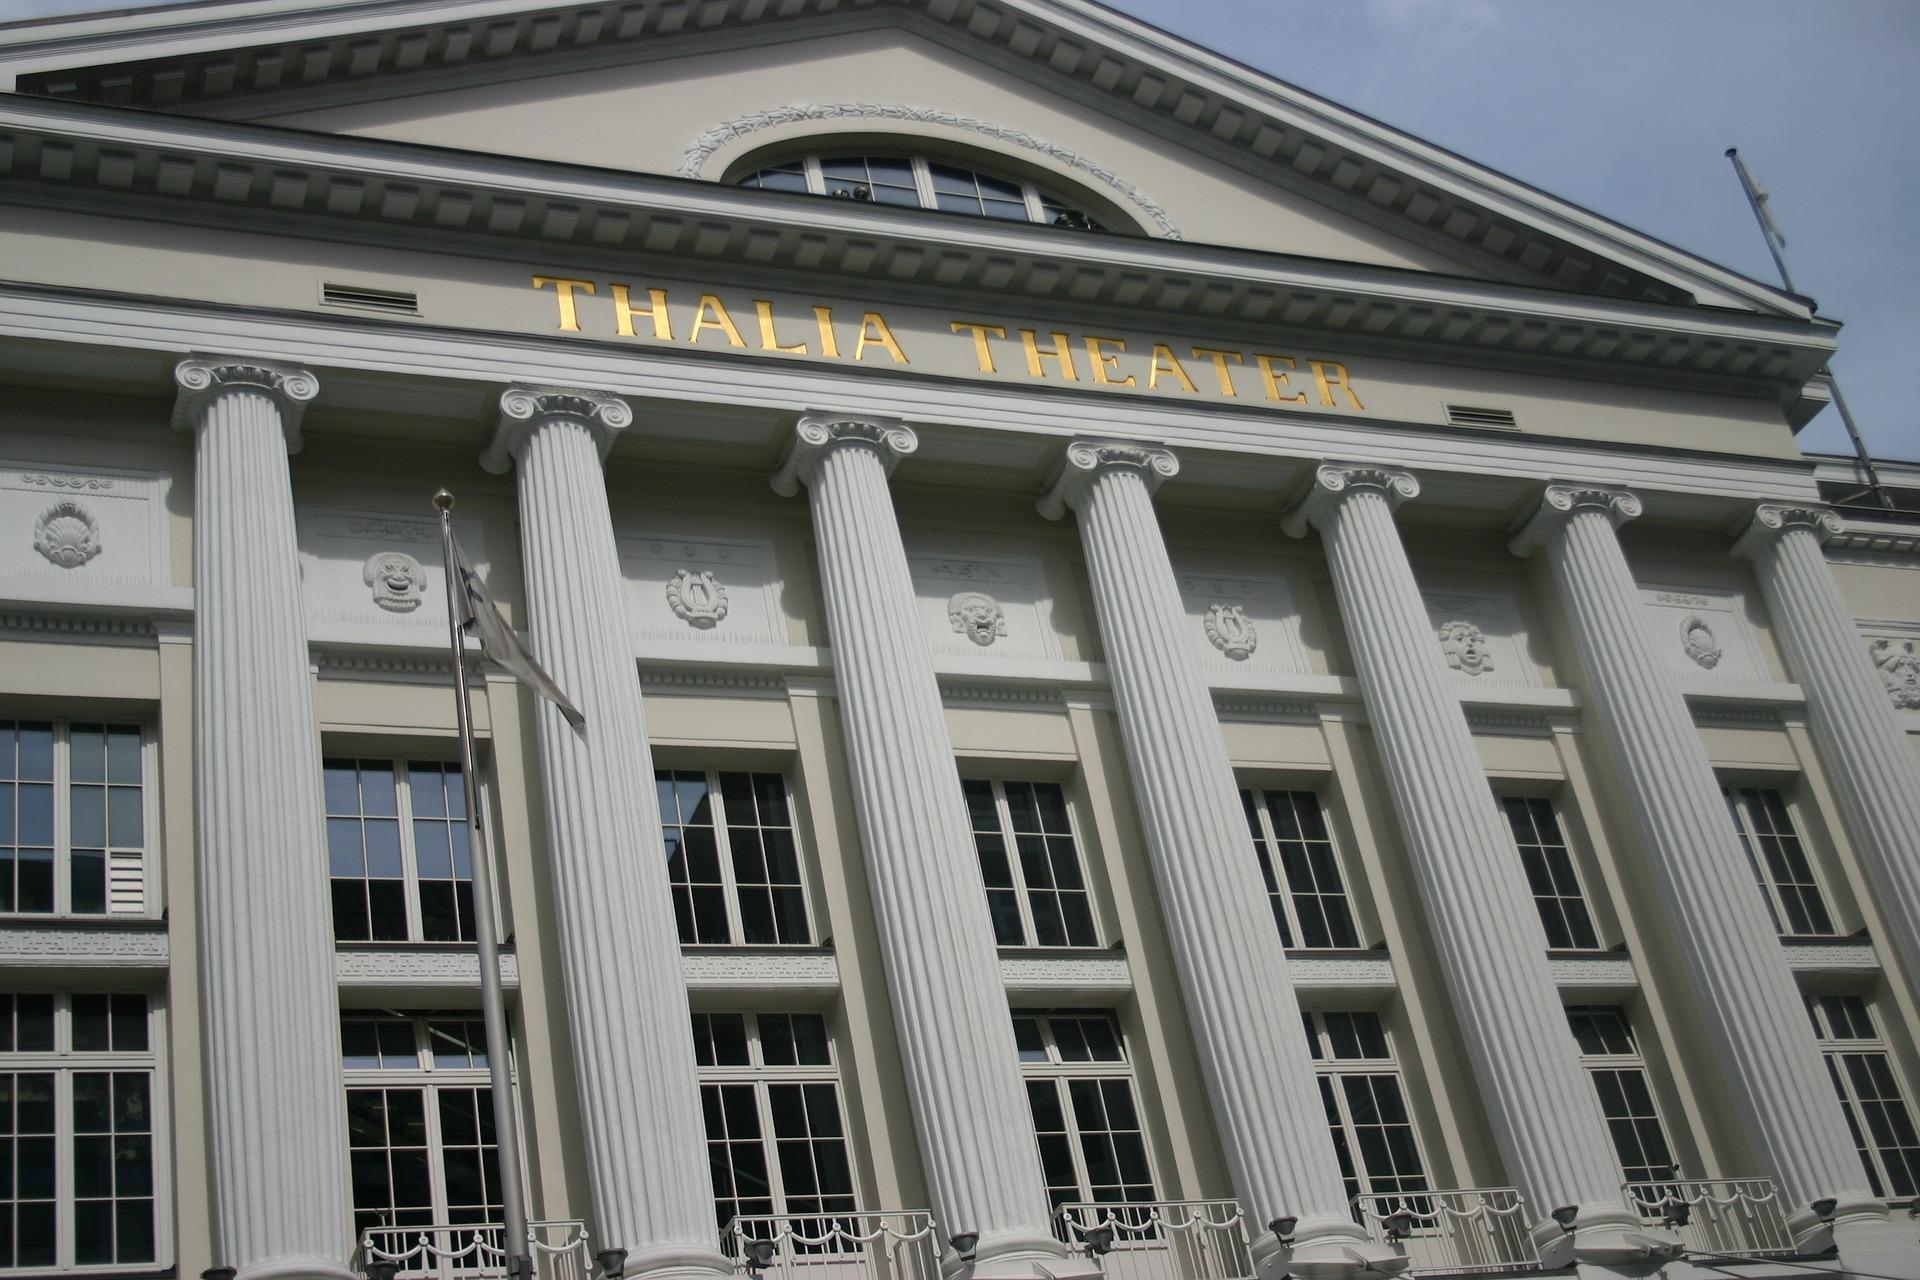 Hamburg Thalia Theater